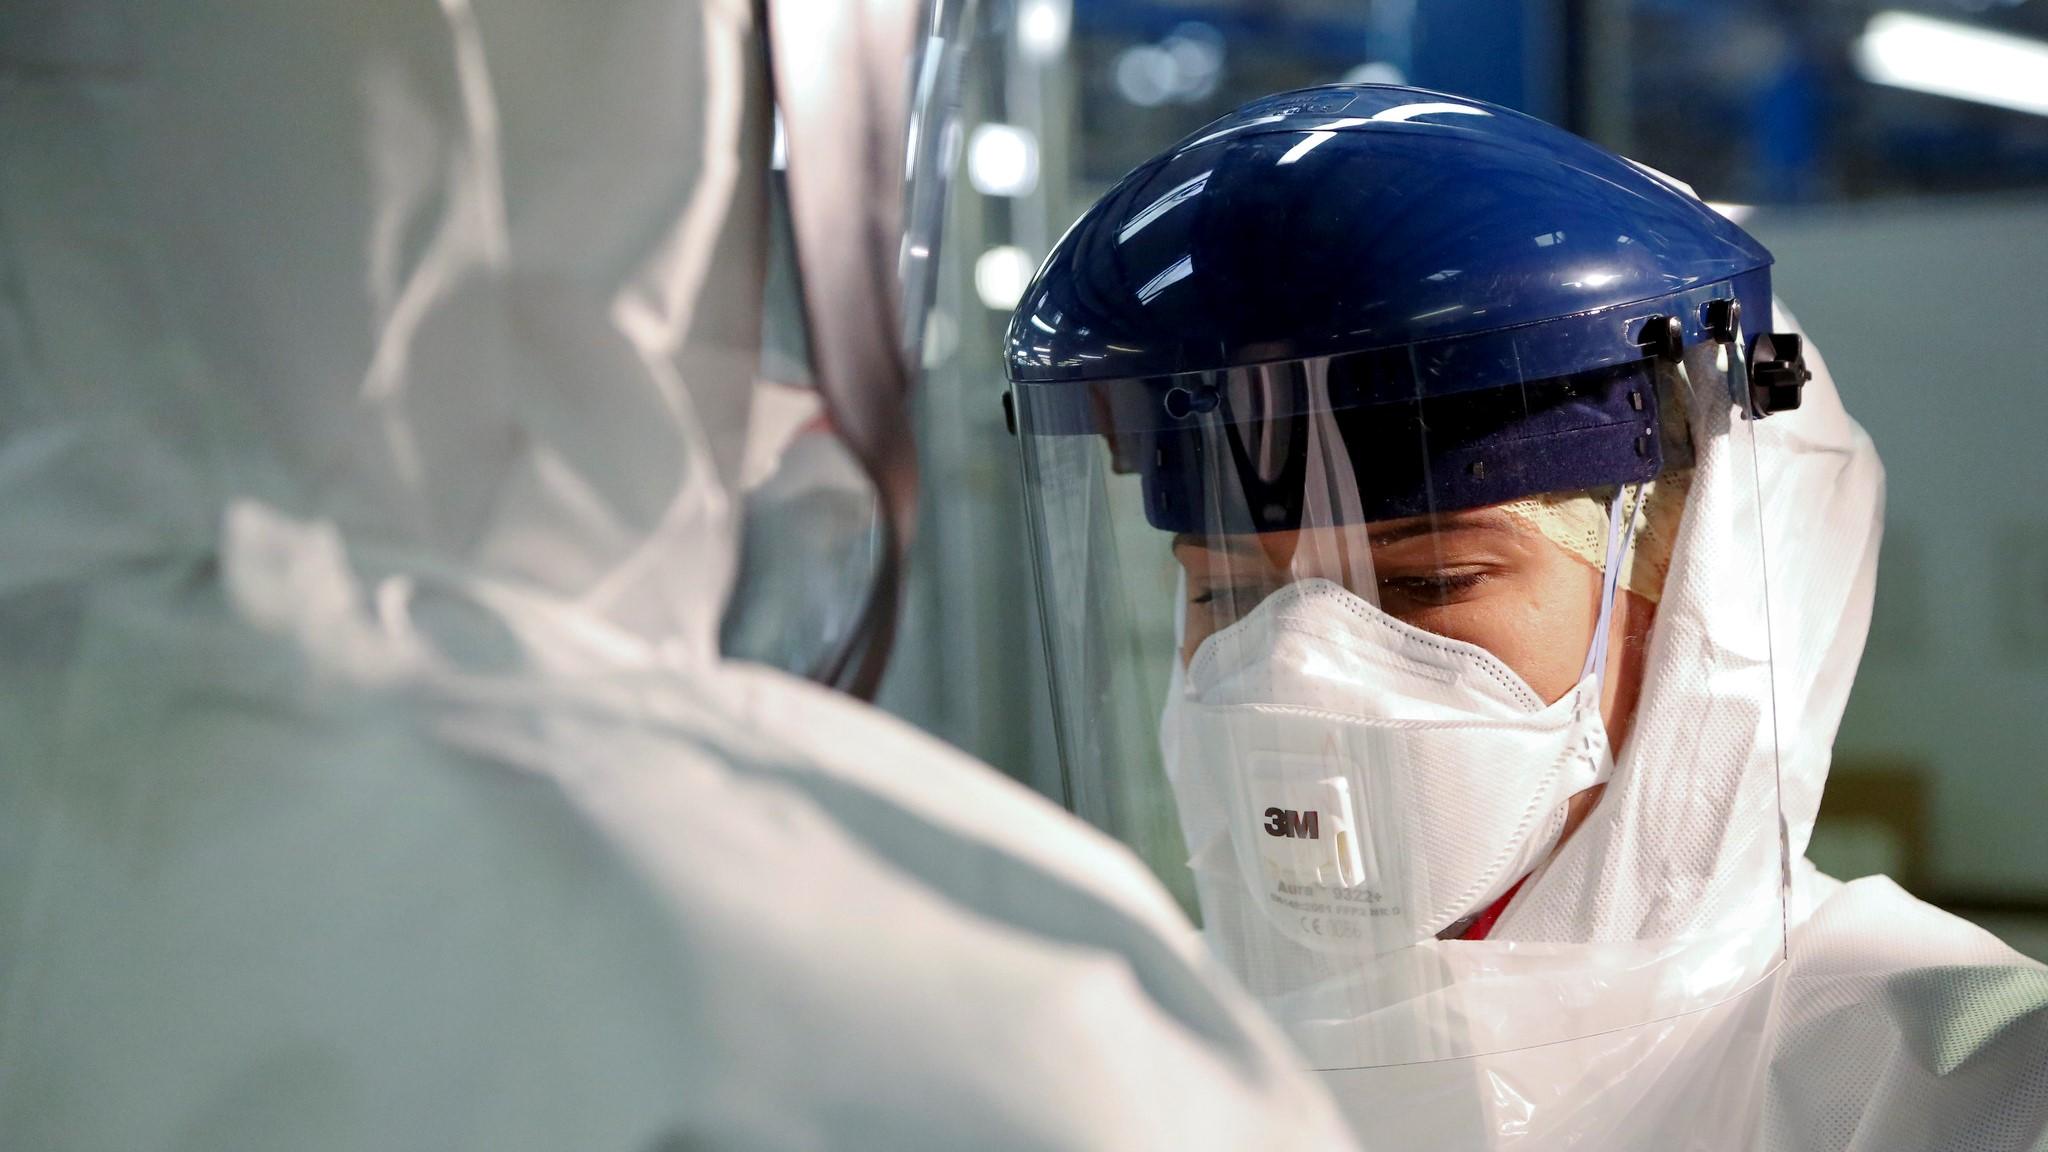 A woman wearing PPE